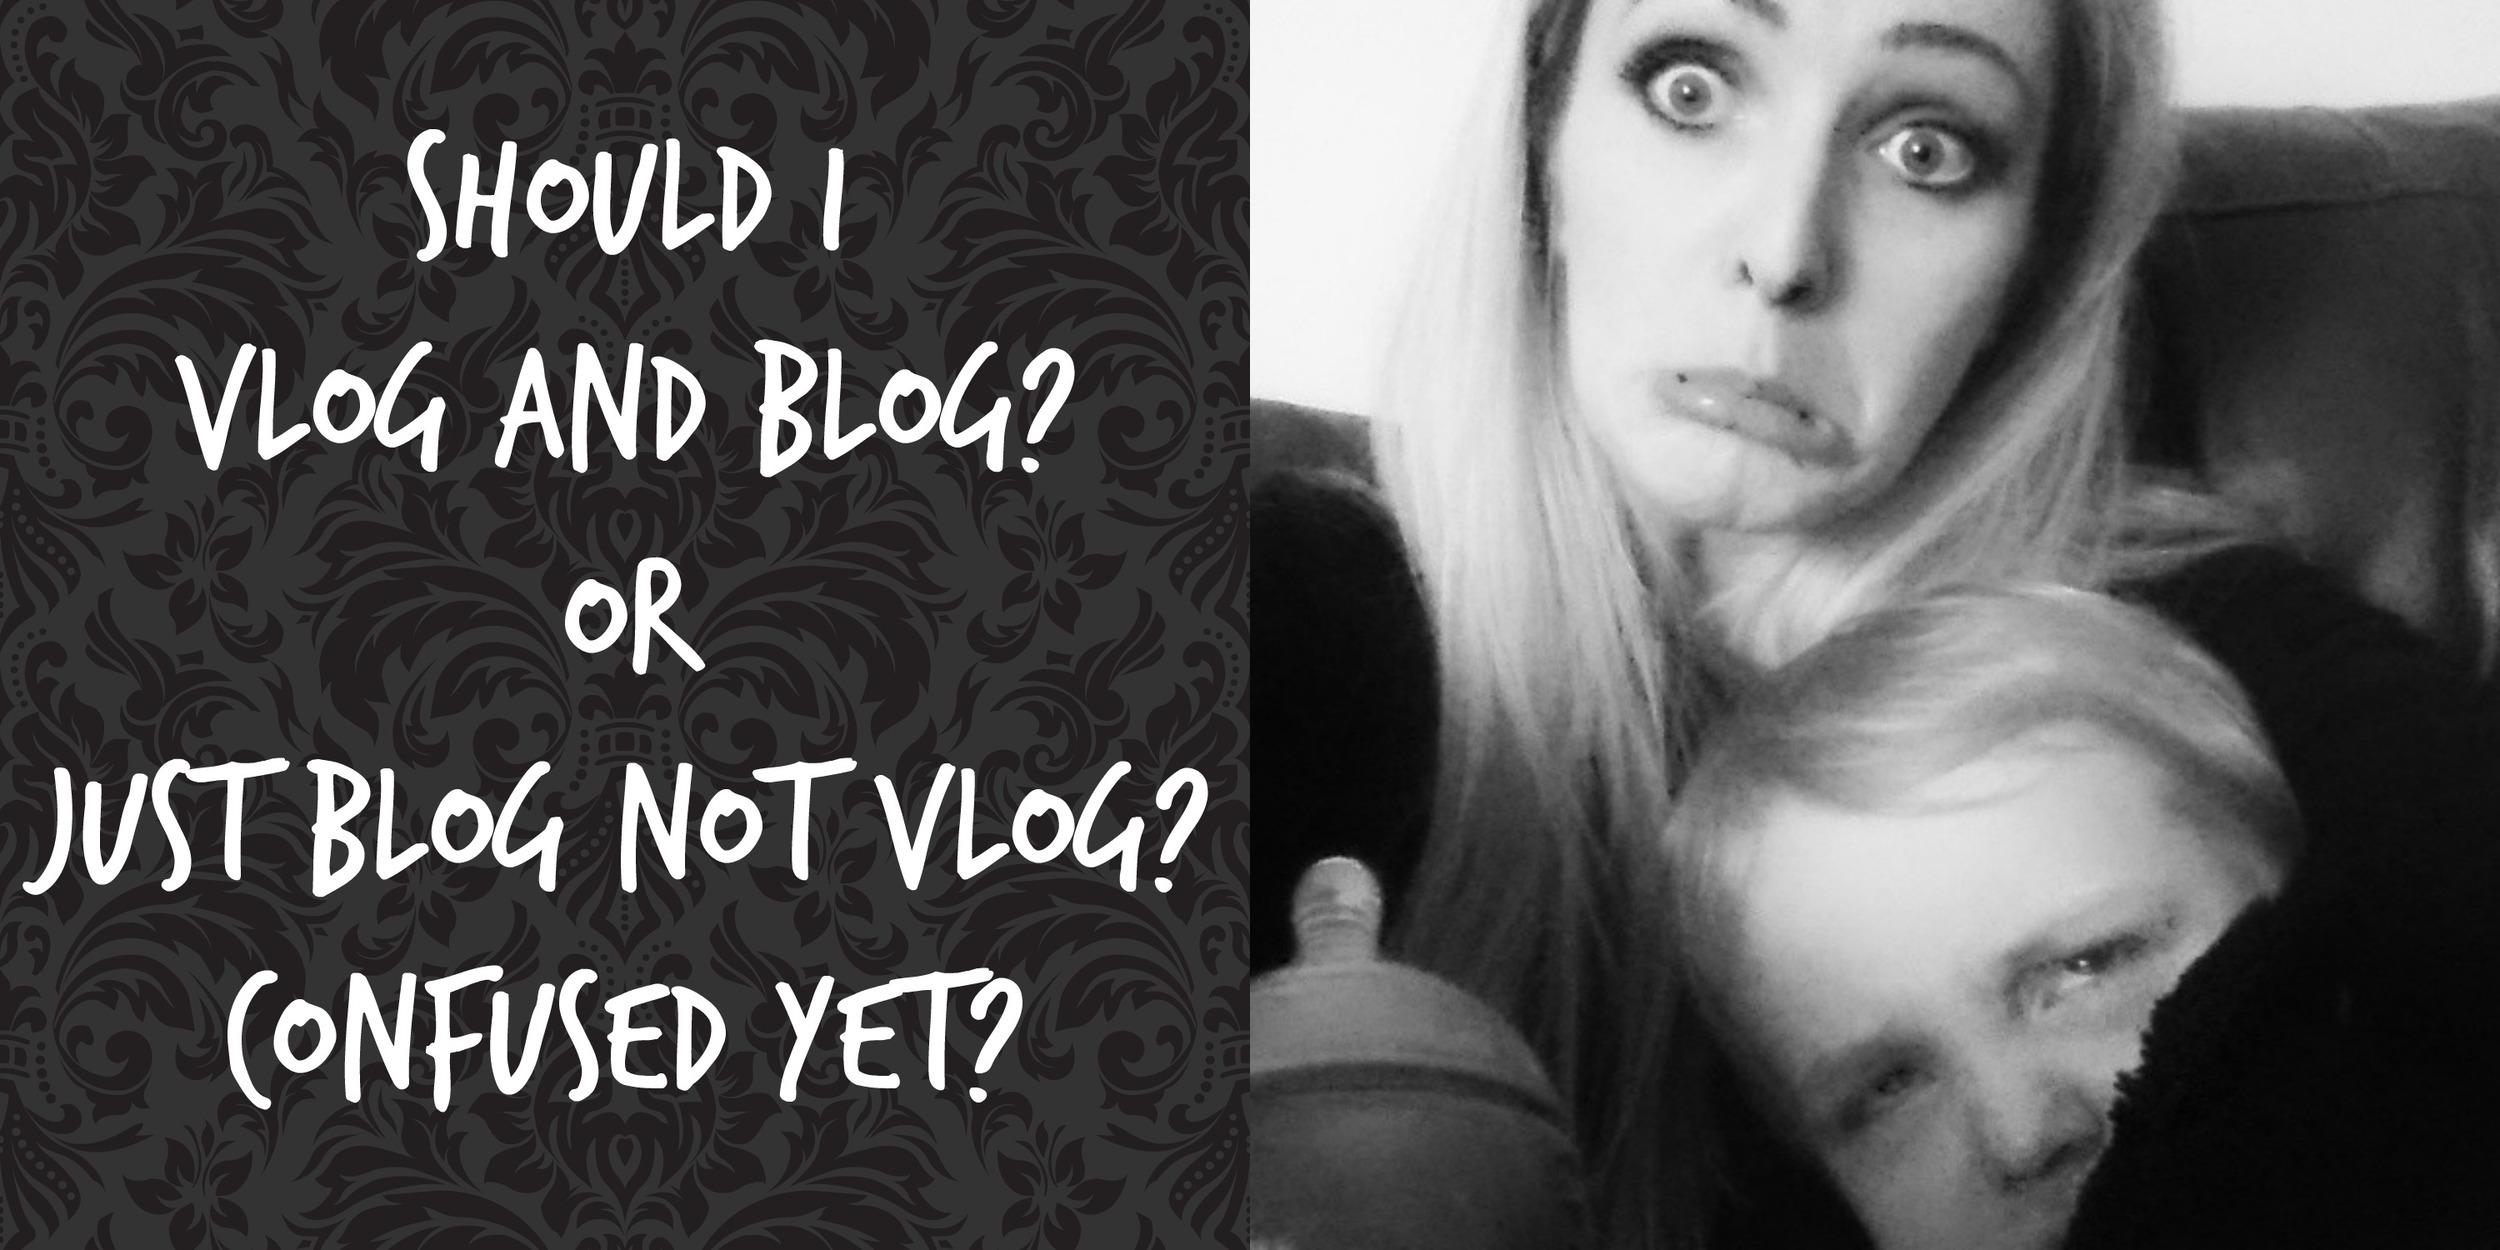 Vlog or Blog.jpg